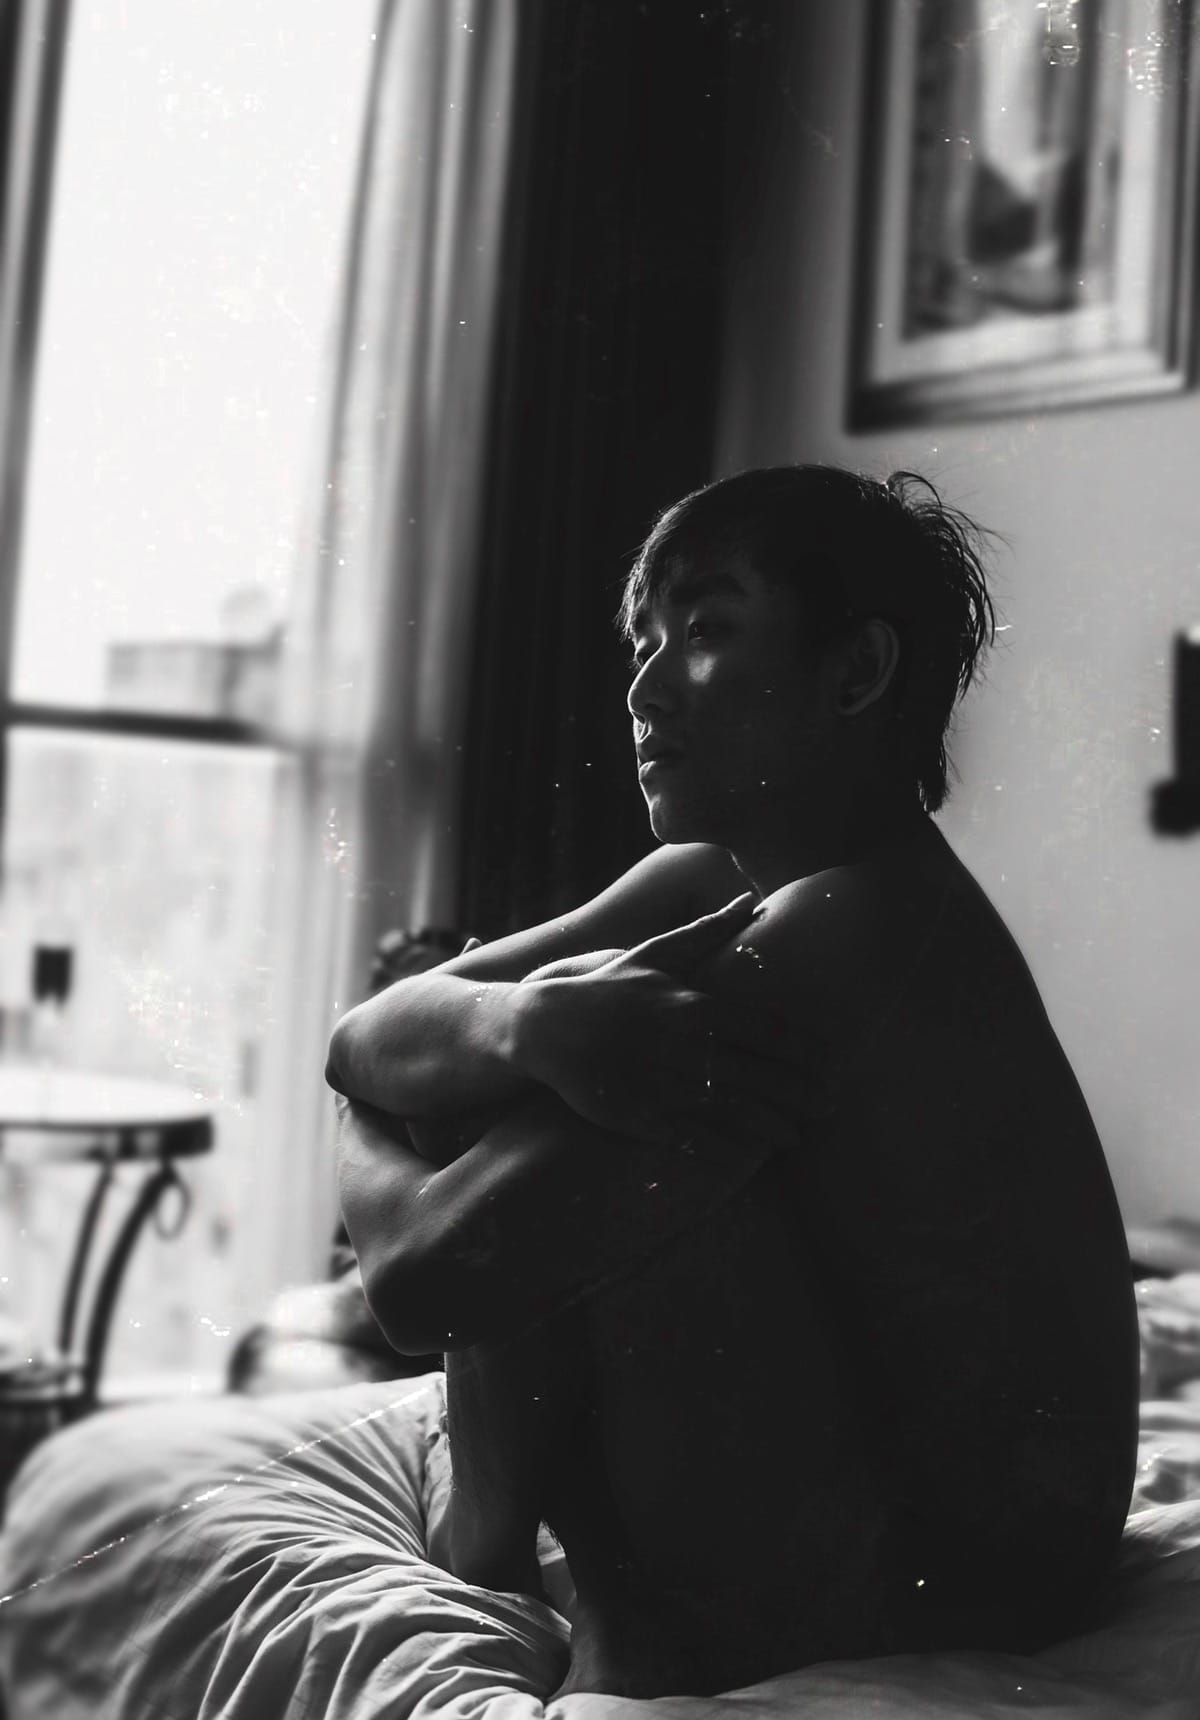 Man sitting cross-legged on bed.